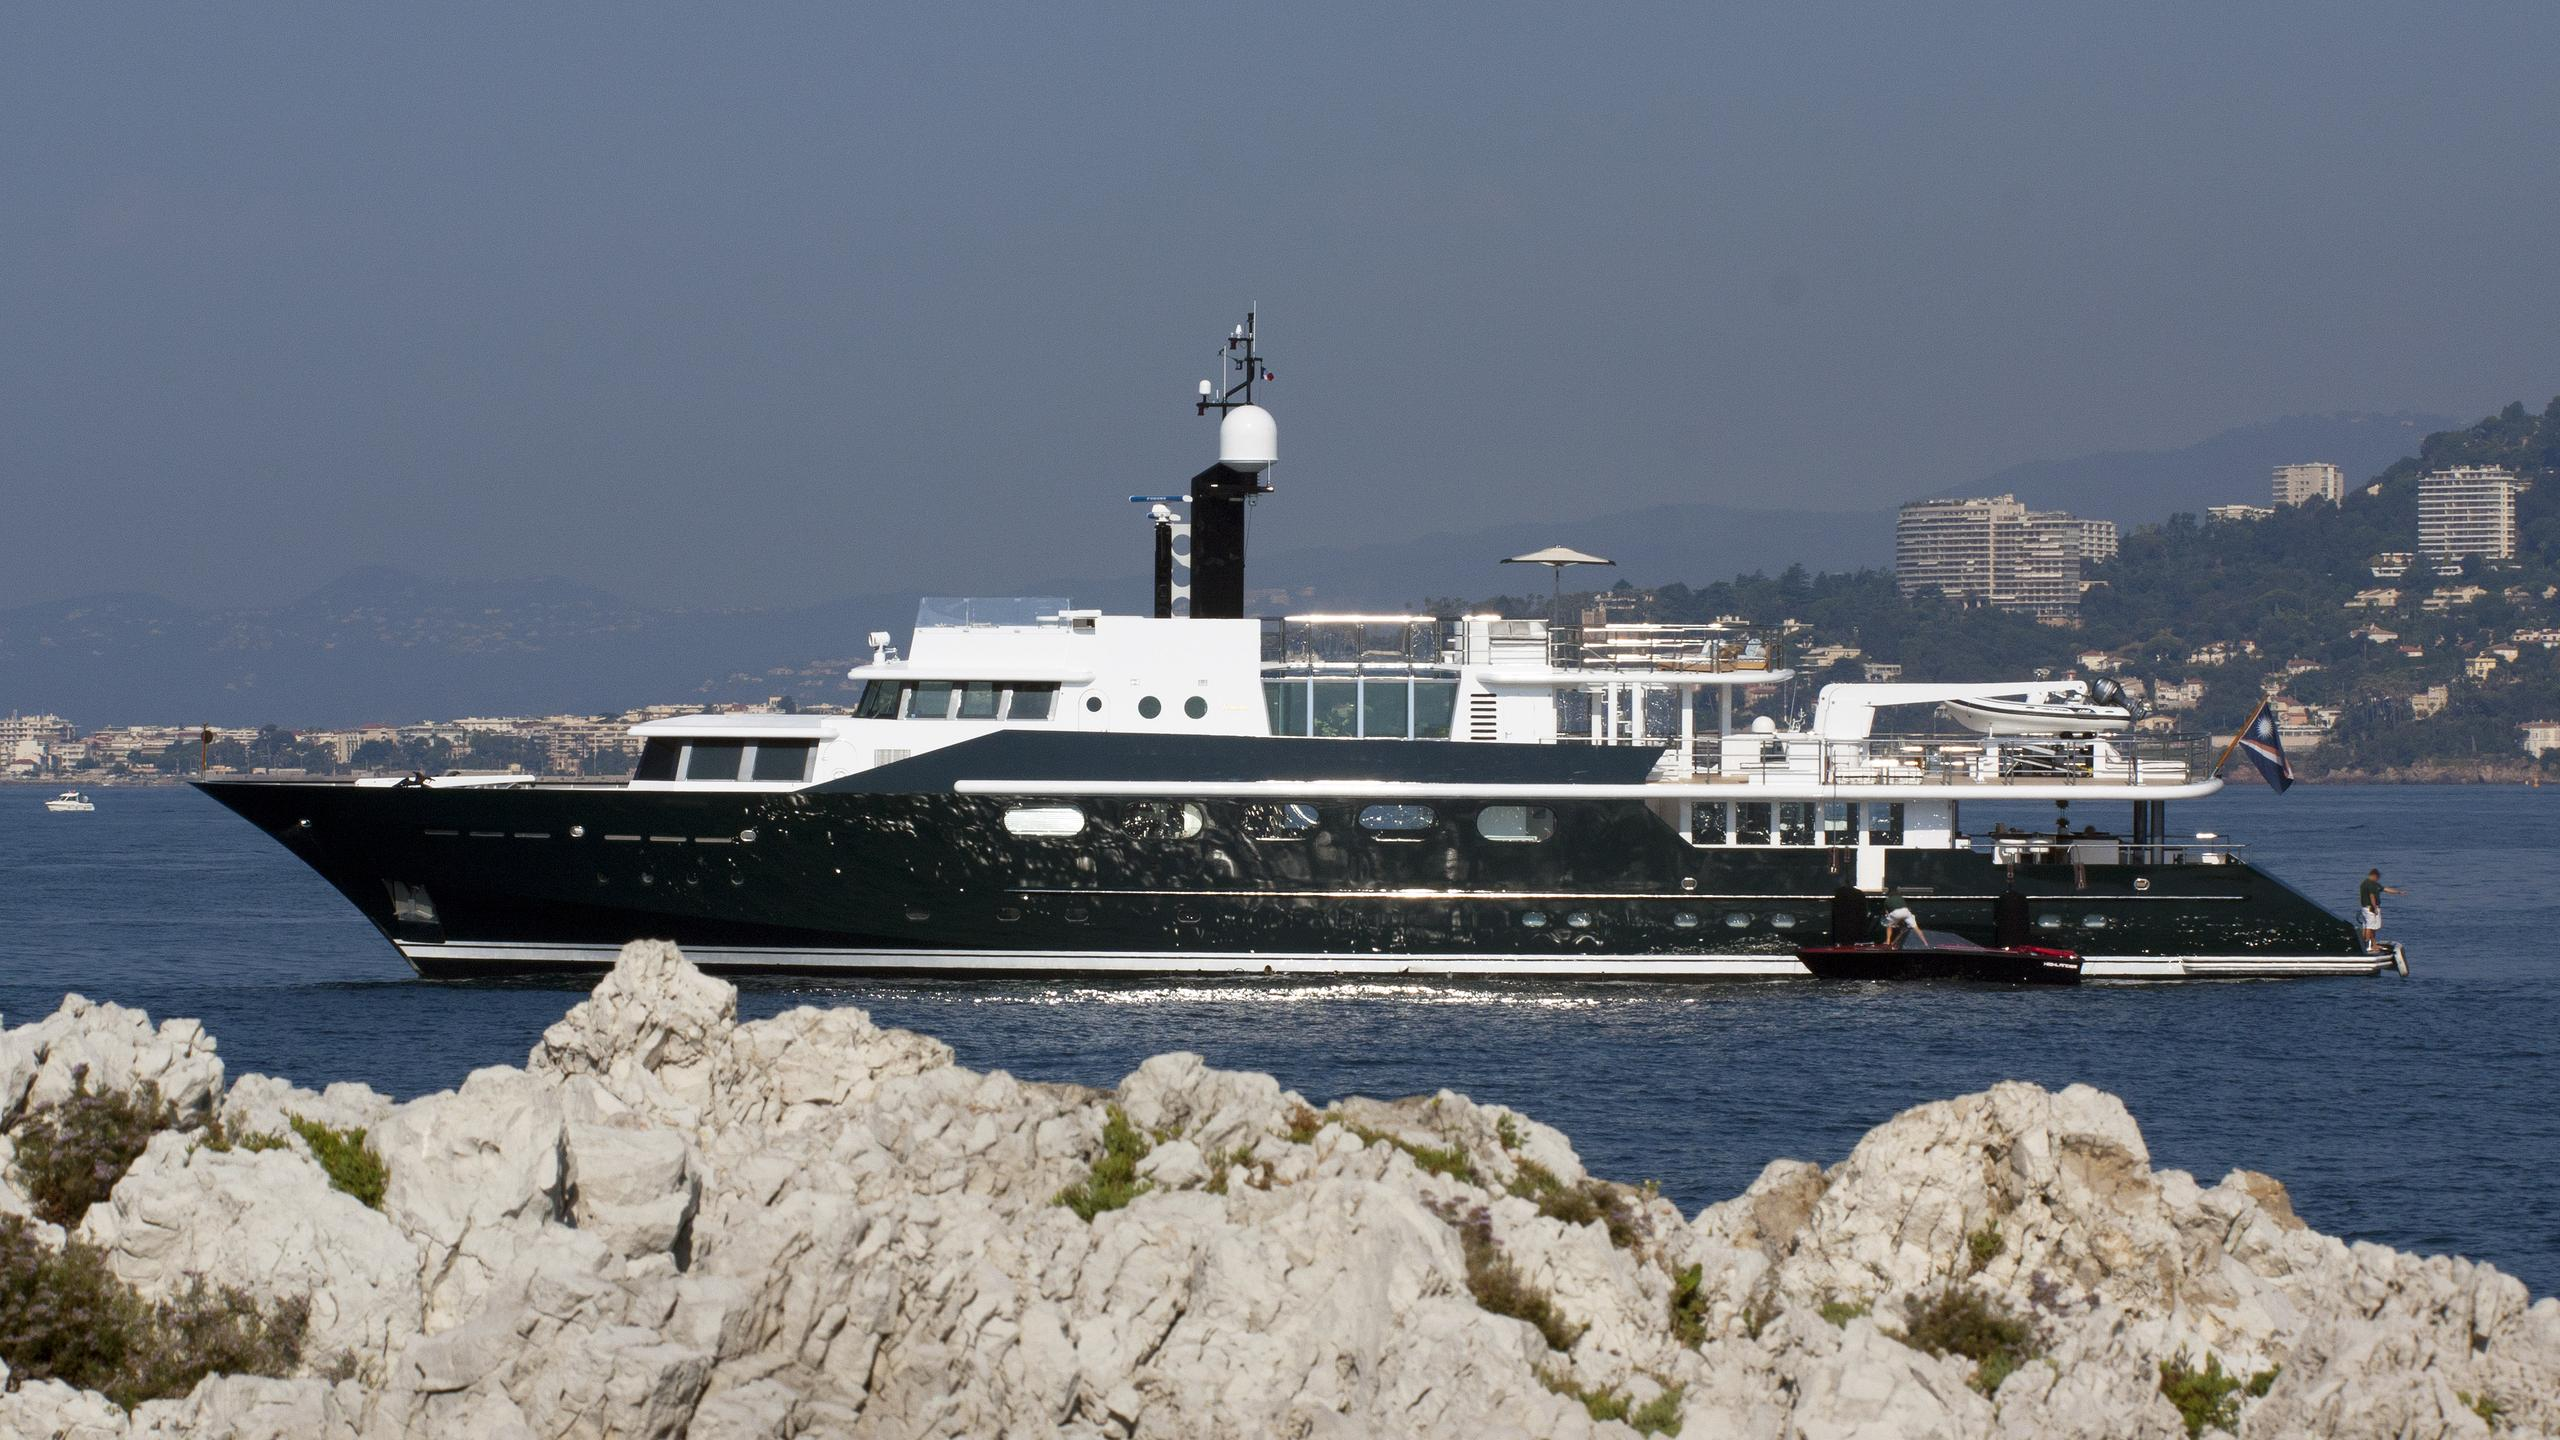 highlander-motor-yacht-feadship-1986-50m-profile